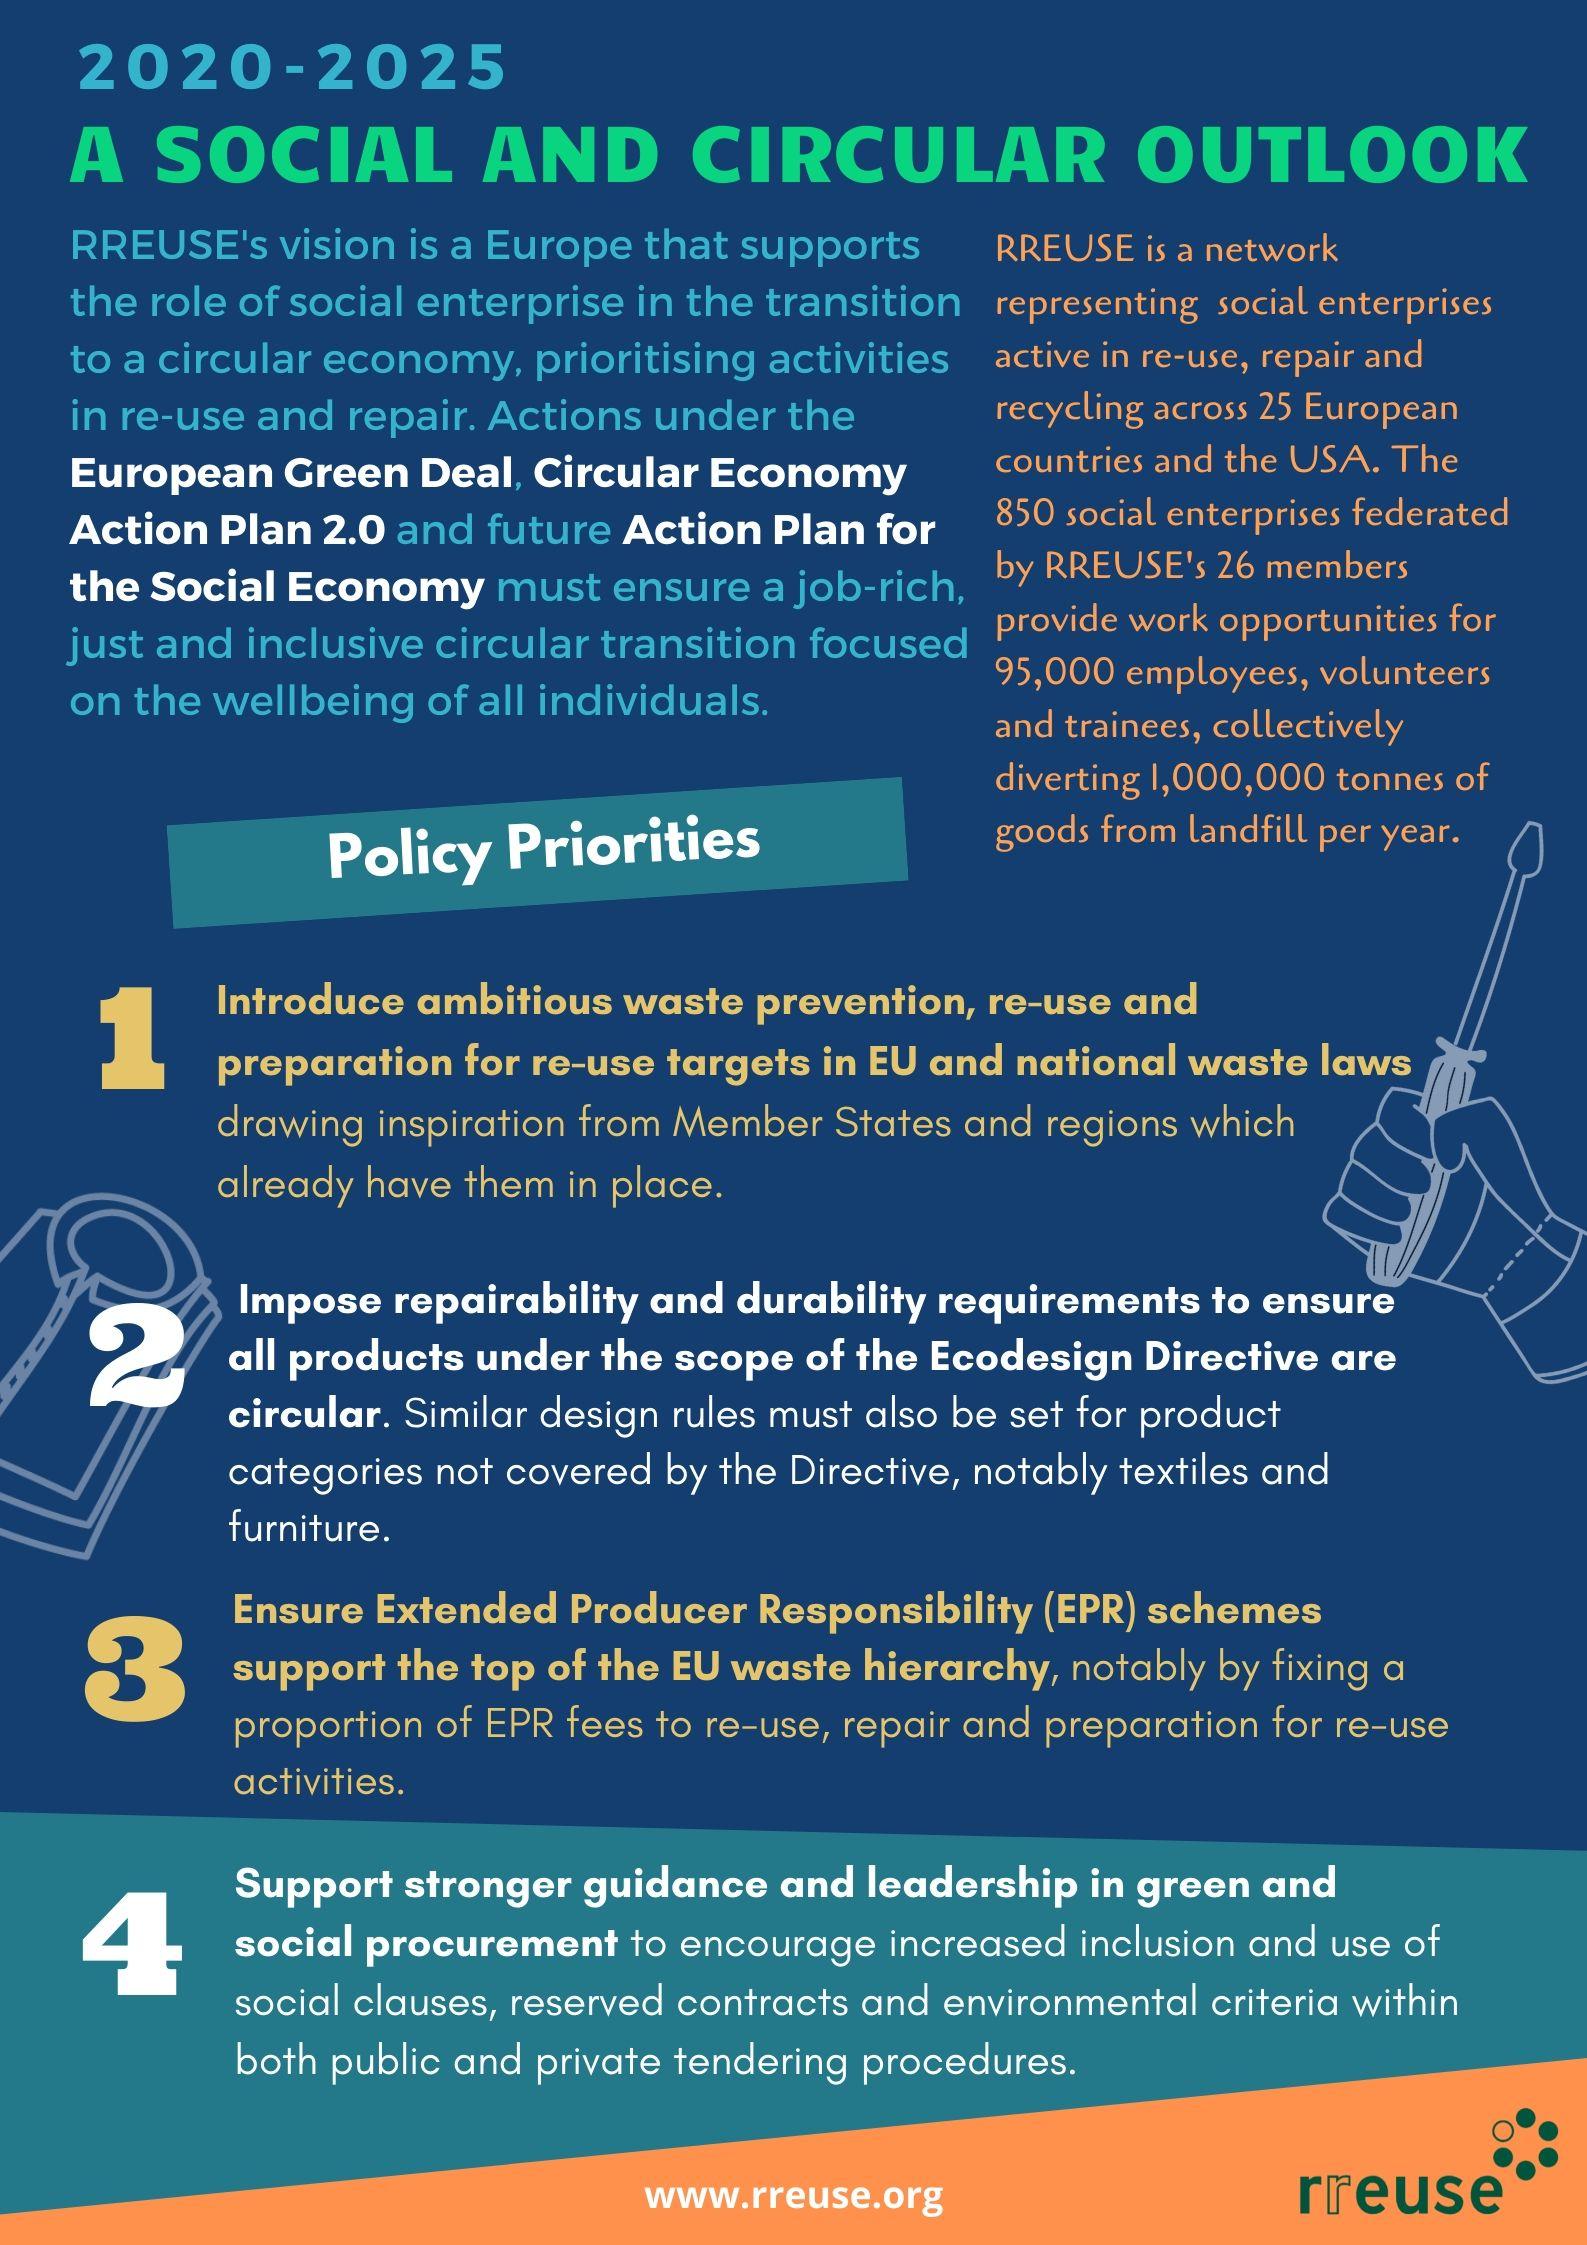 Social and Circular Outlook 2020-2025